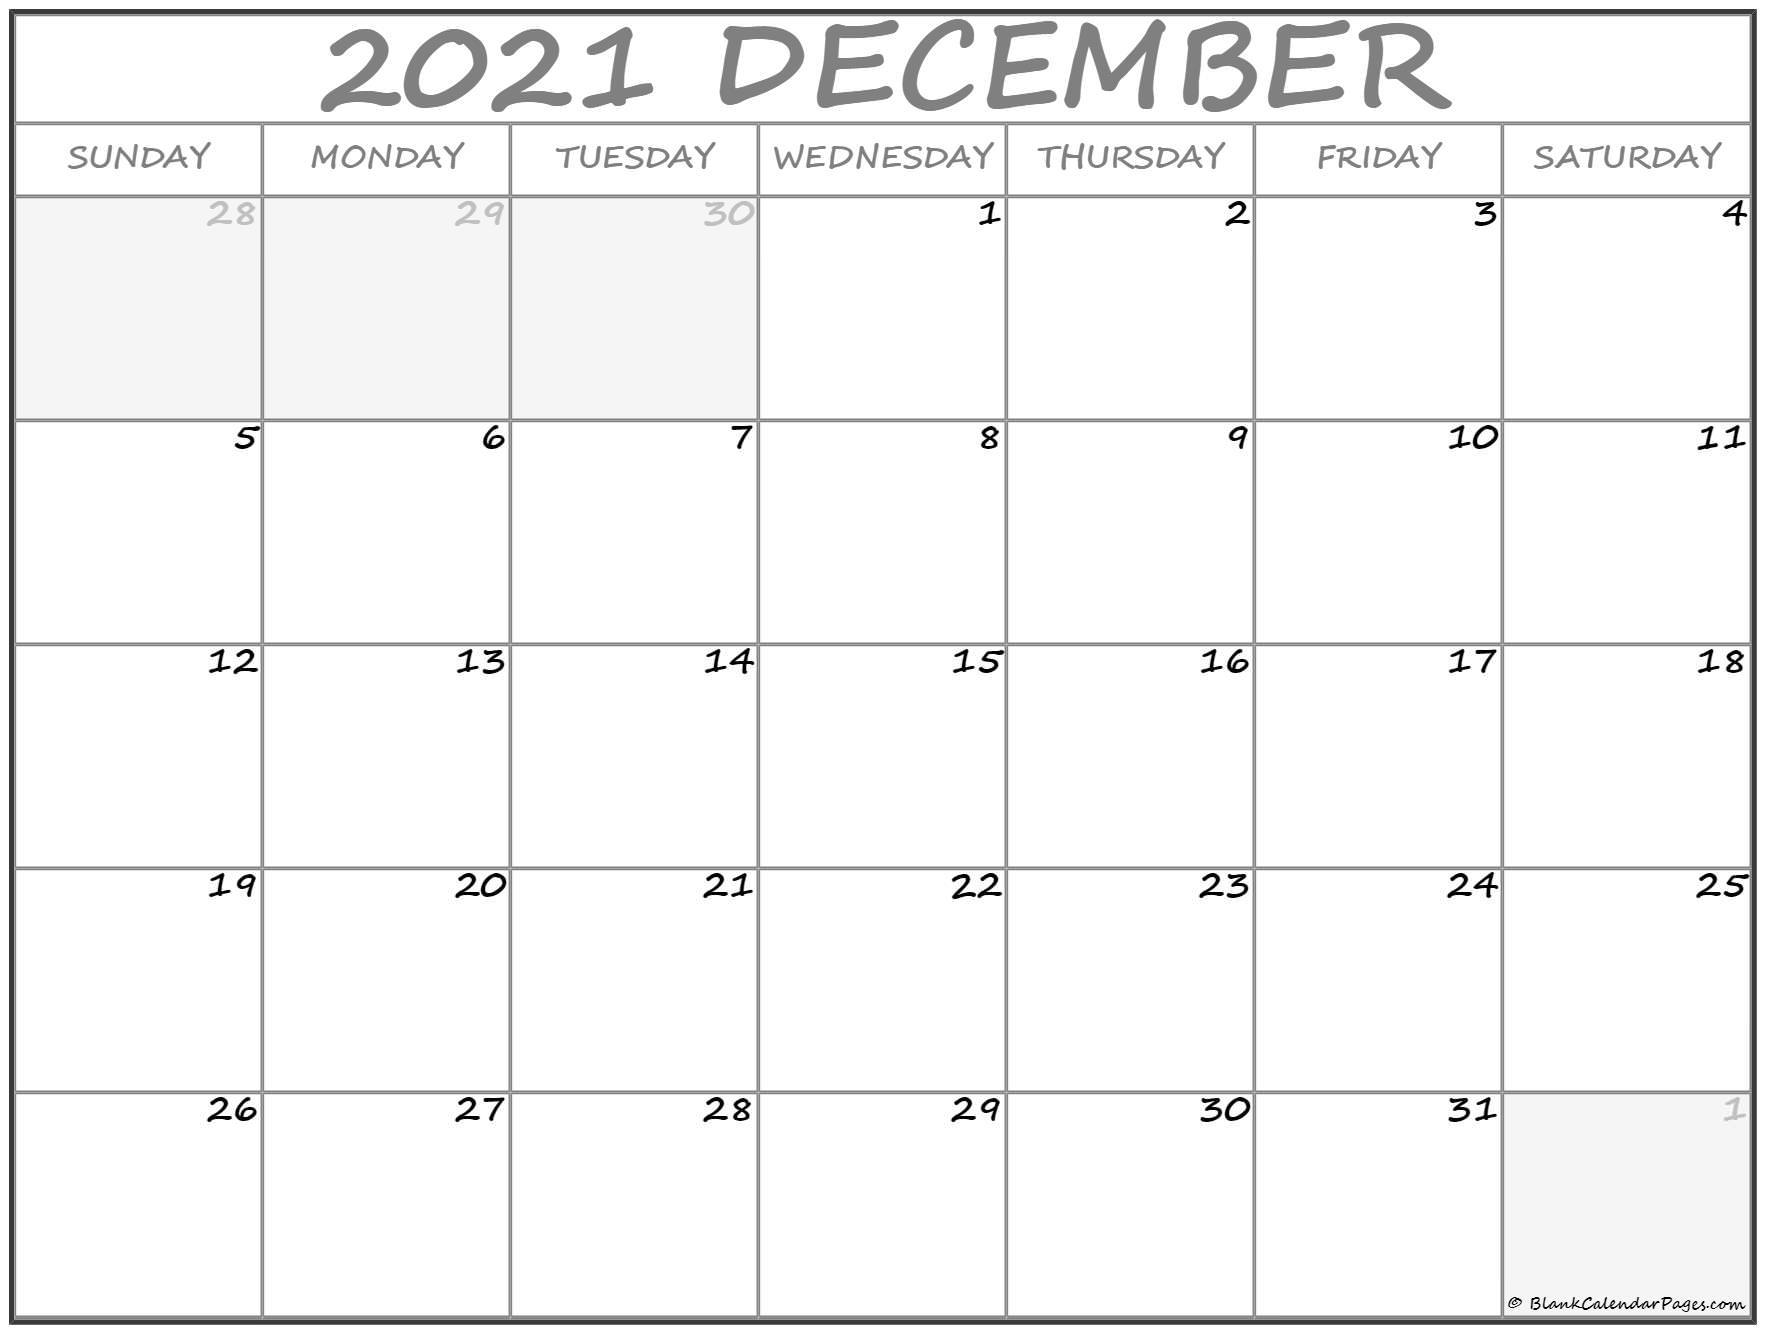 December 2021 Calendar | Free Printable Calendar Templates